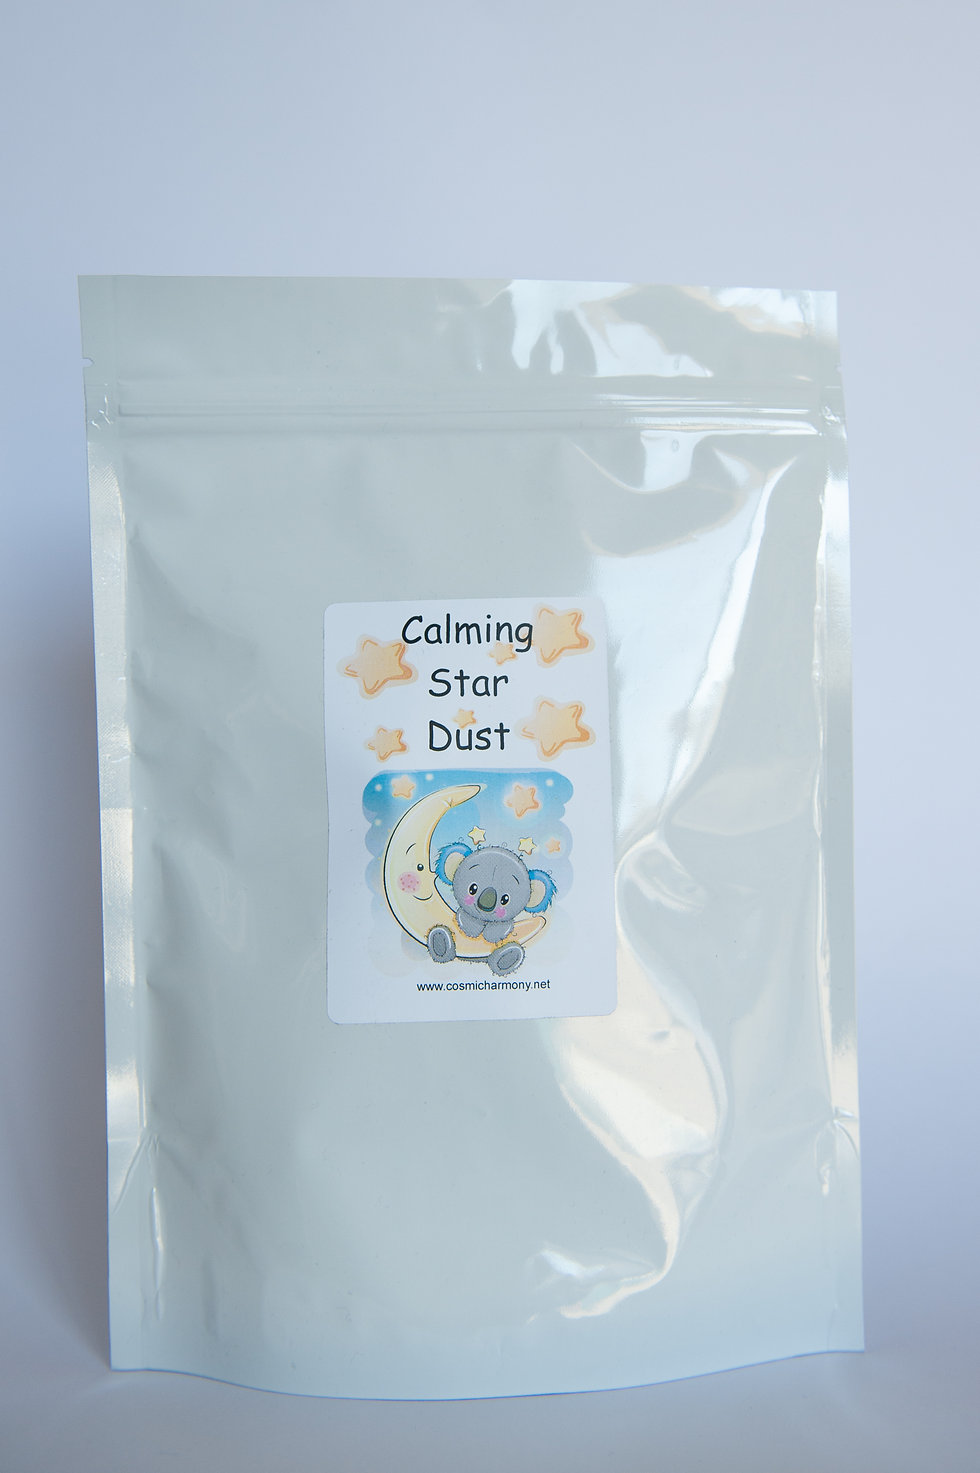 Calming Star Dust